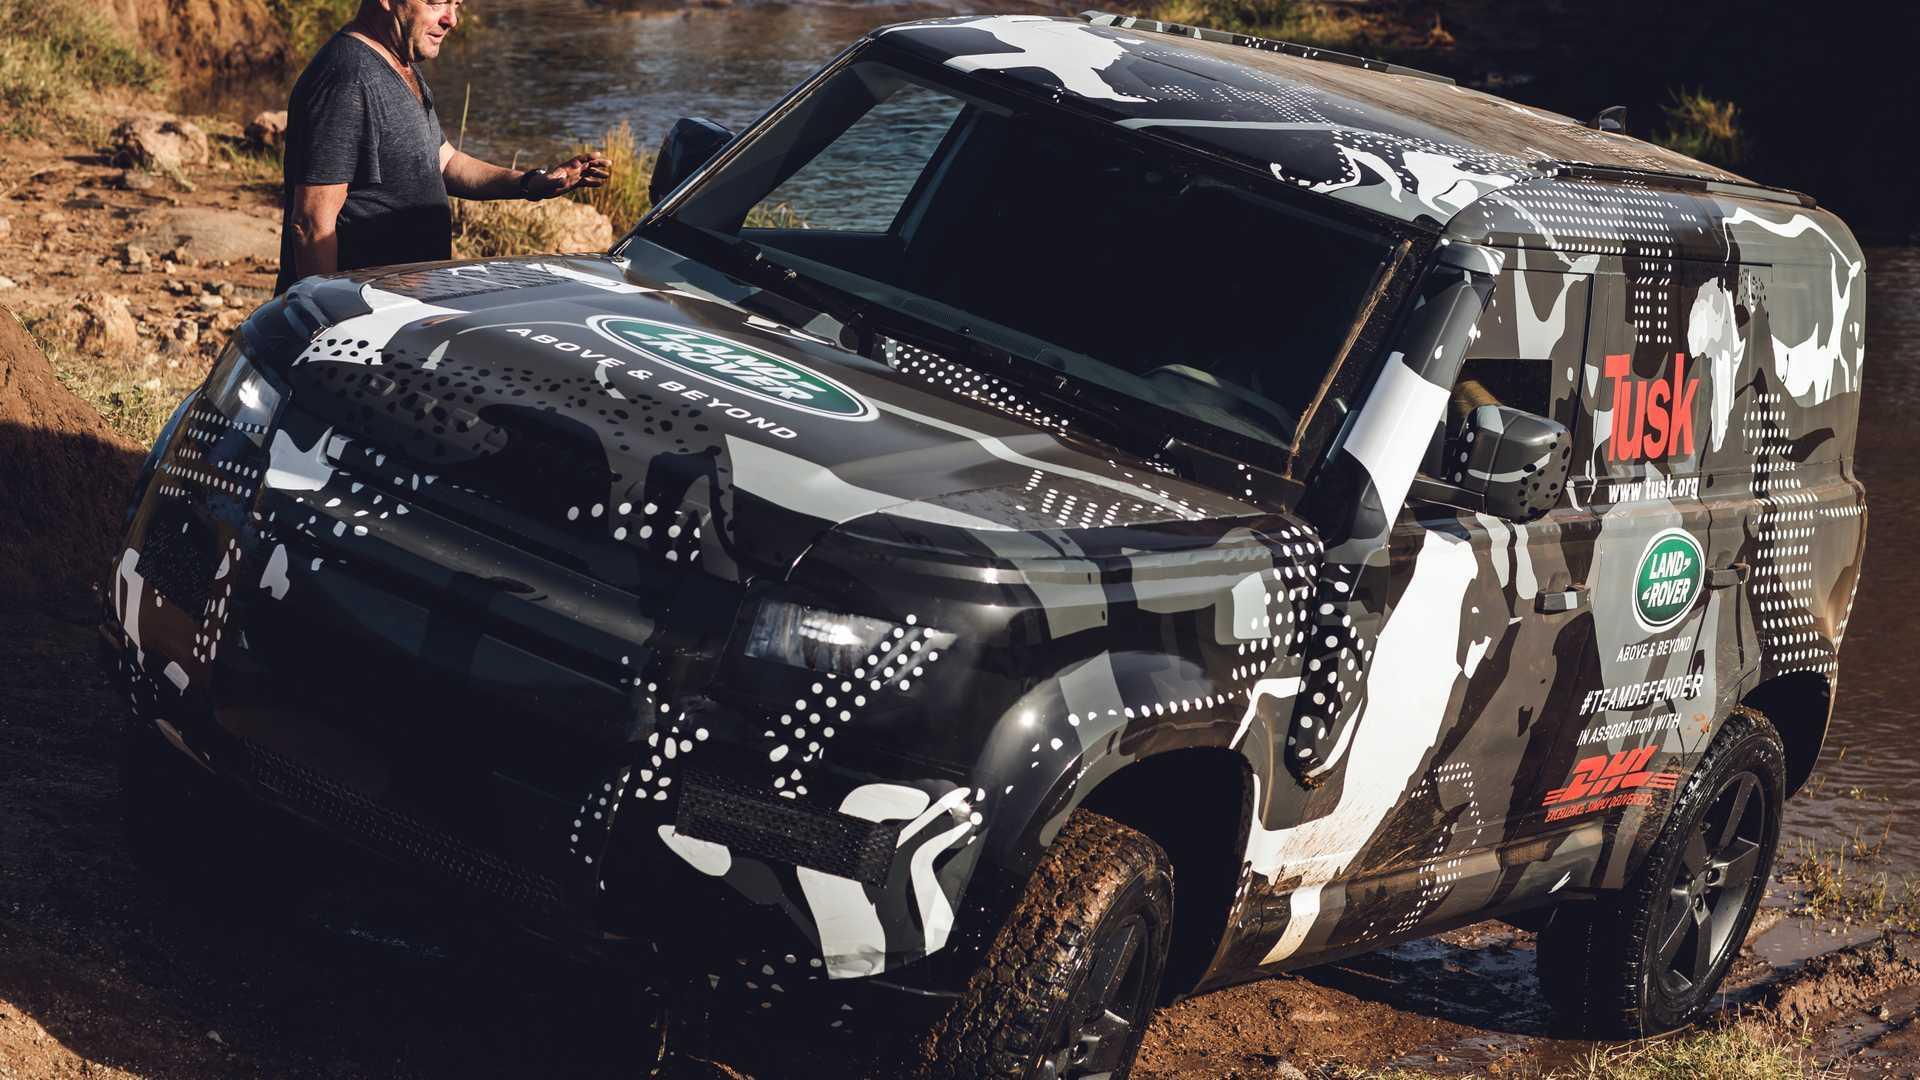 2020-land-rover-defender-testing-in-kenya